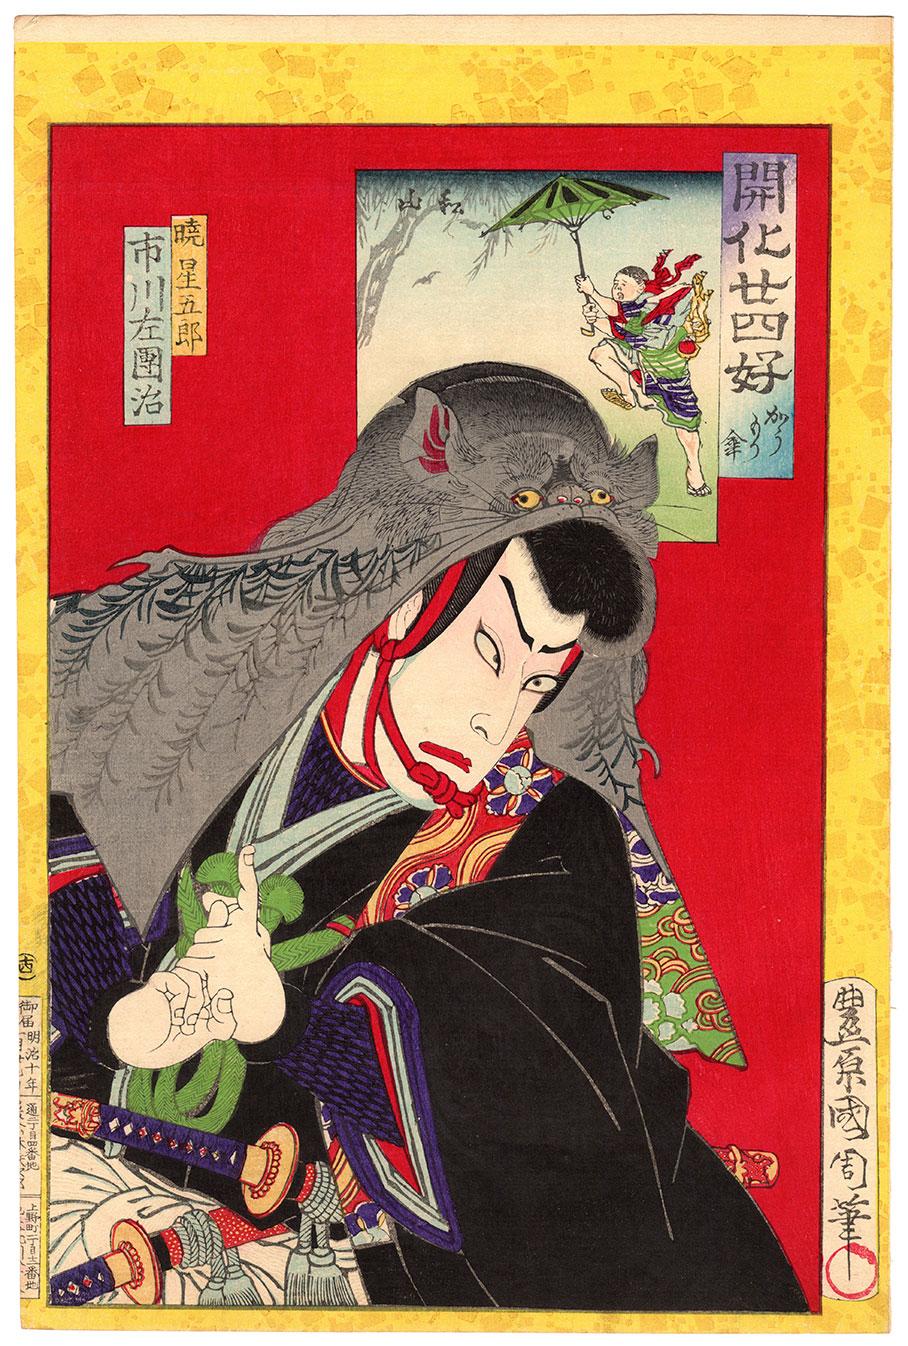 Japanese Bandit